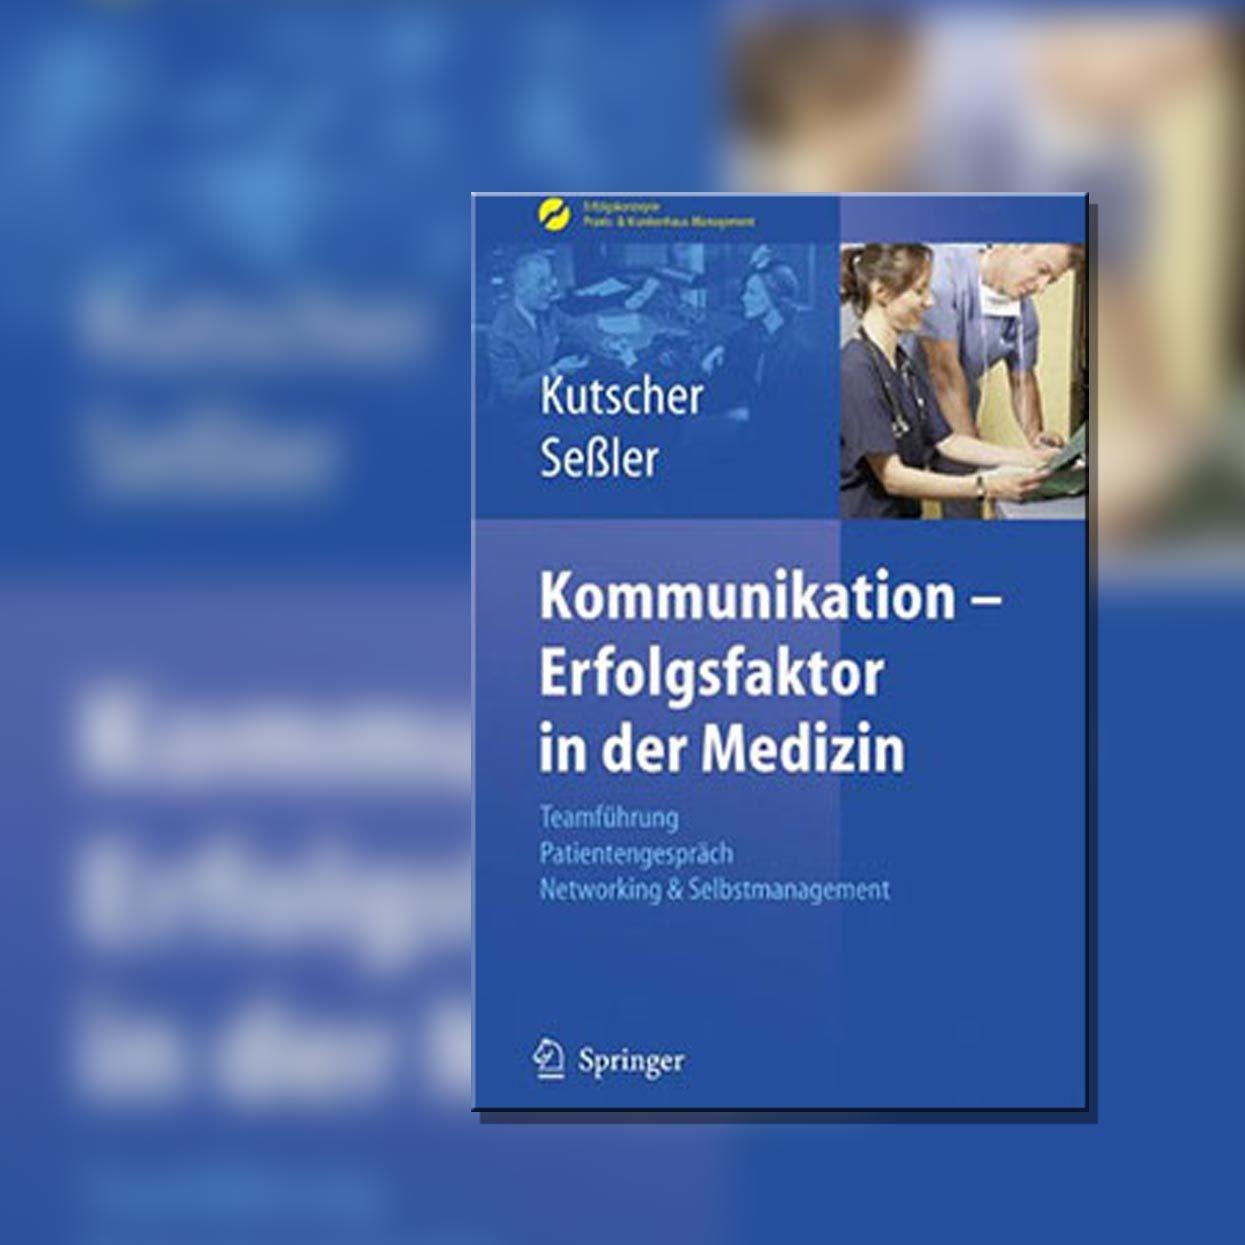 cover_Kommunikation-Erfolgsfaktor_in_der_Medizin